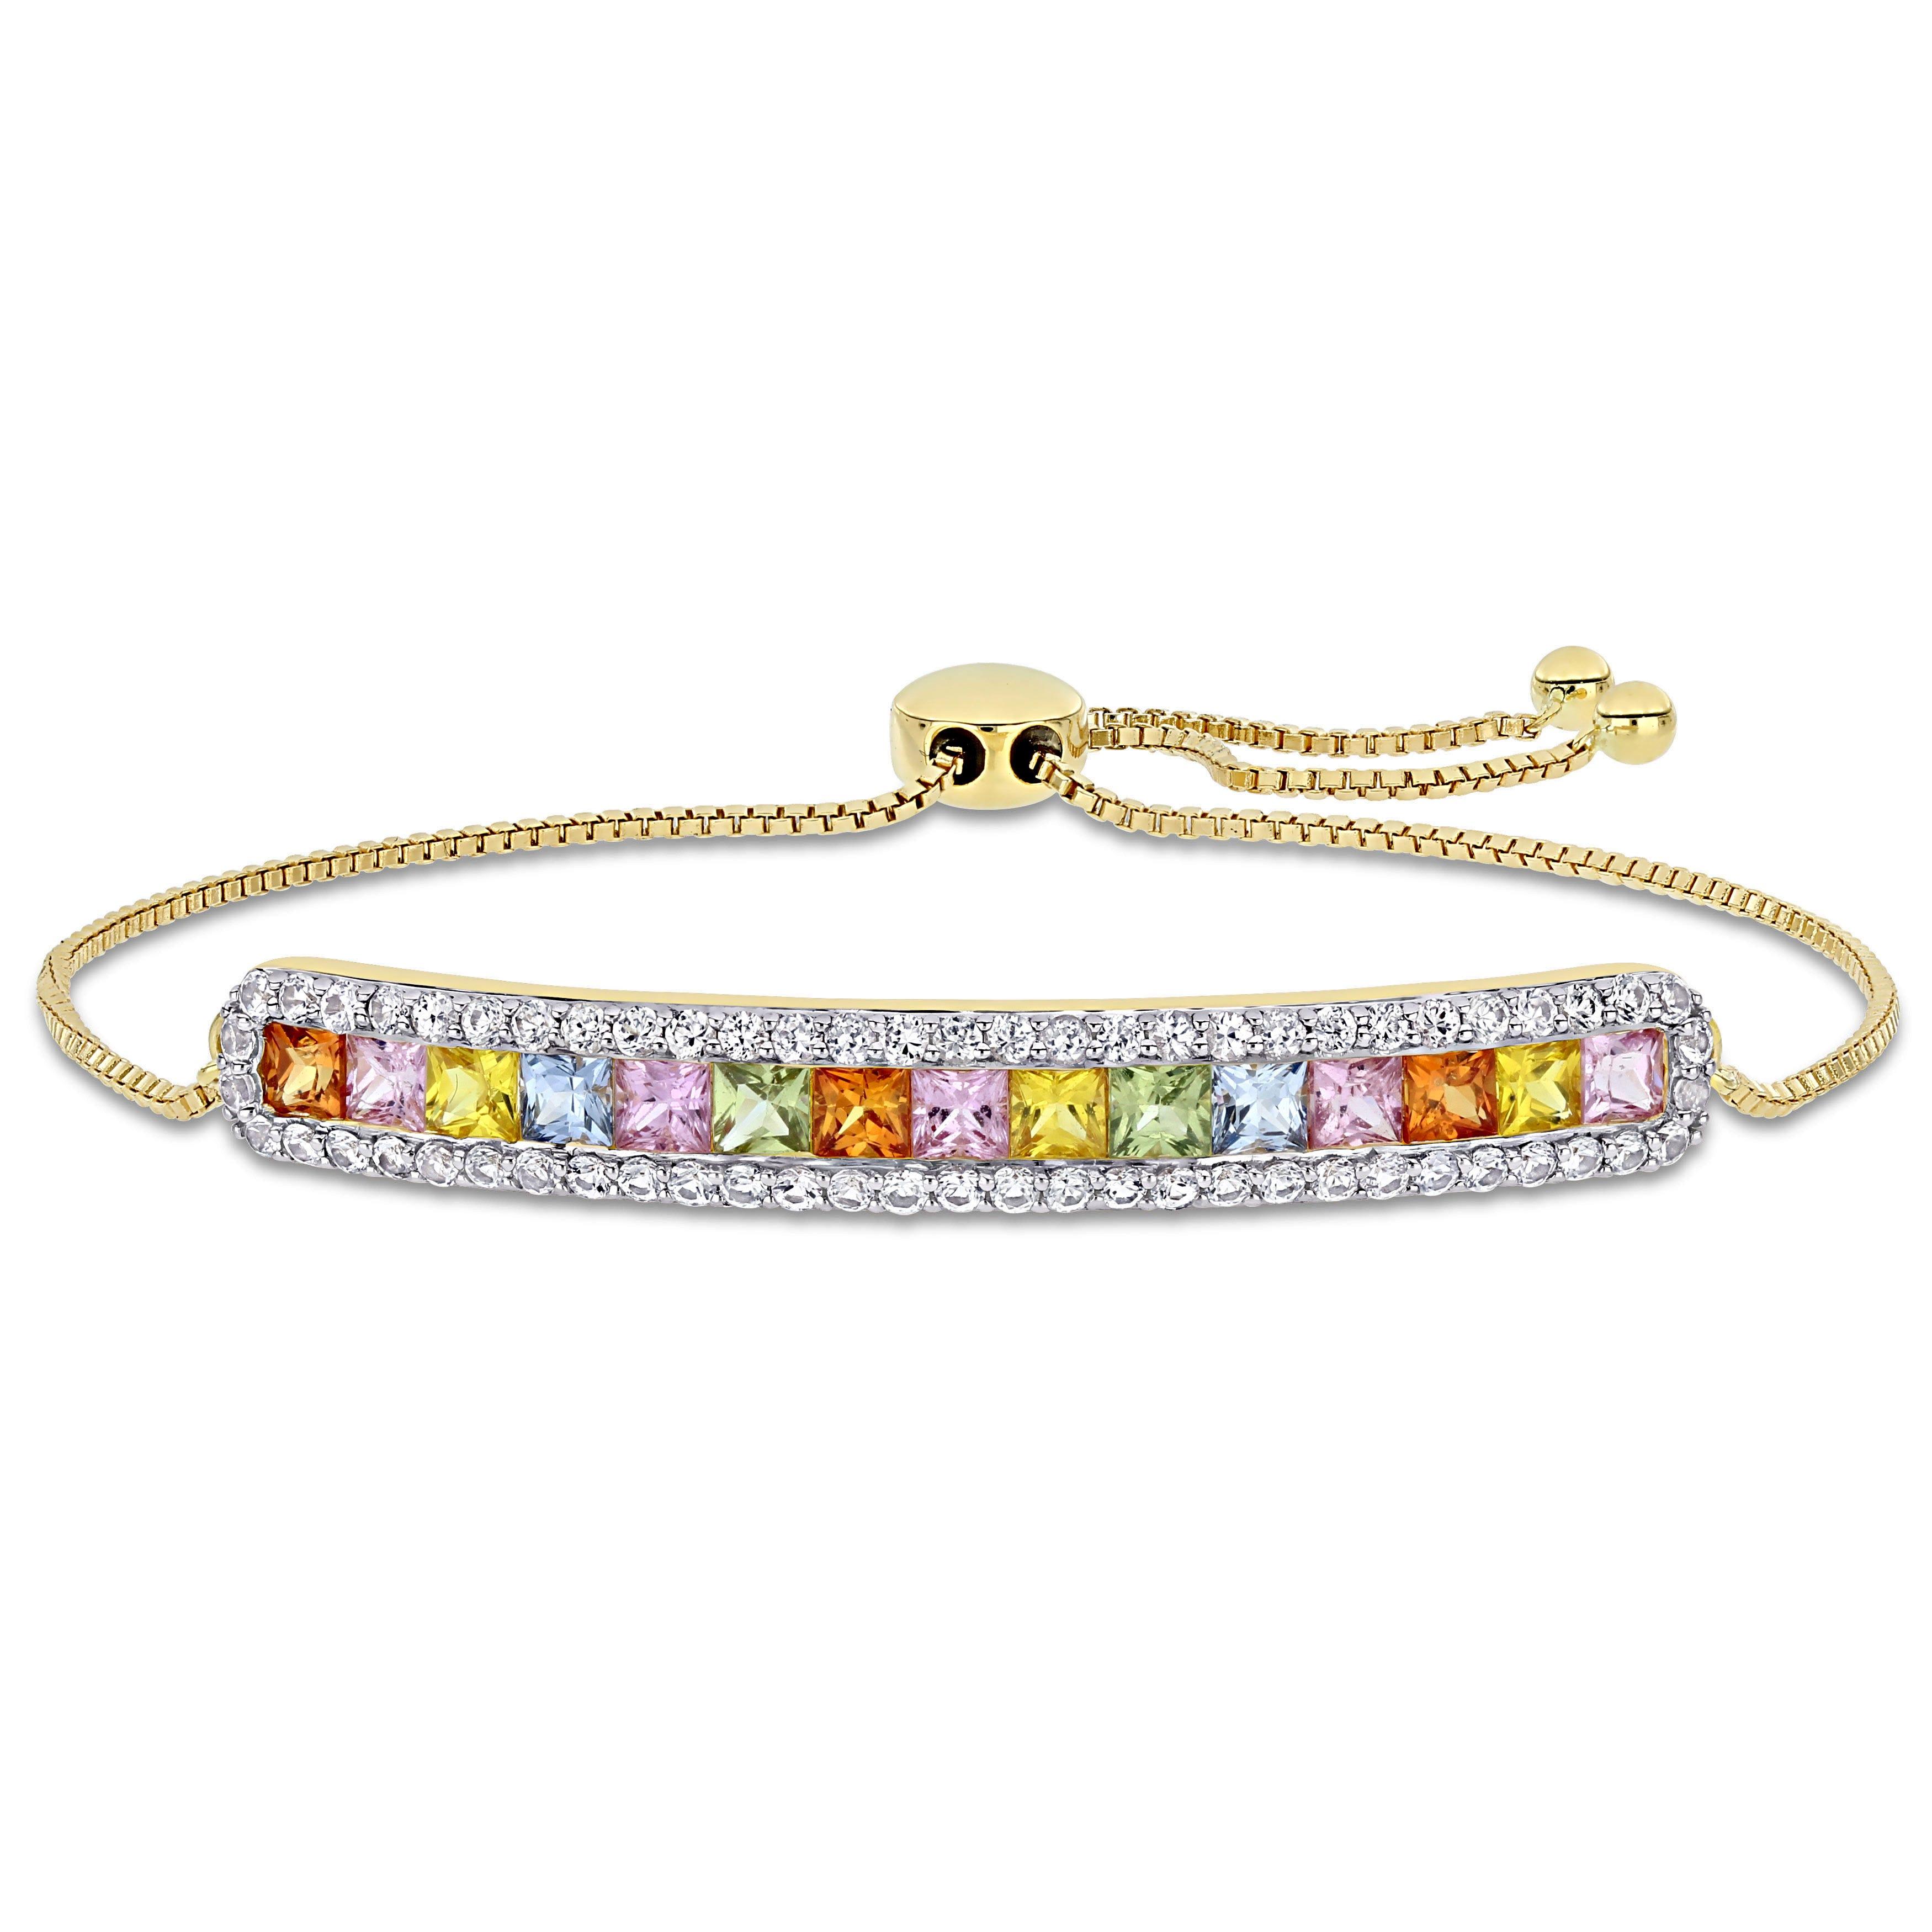 Rainbow Created Sapphire & Diamond Princess Cut  Bolo Bracelet in 14k Yellow Gold